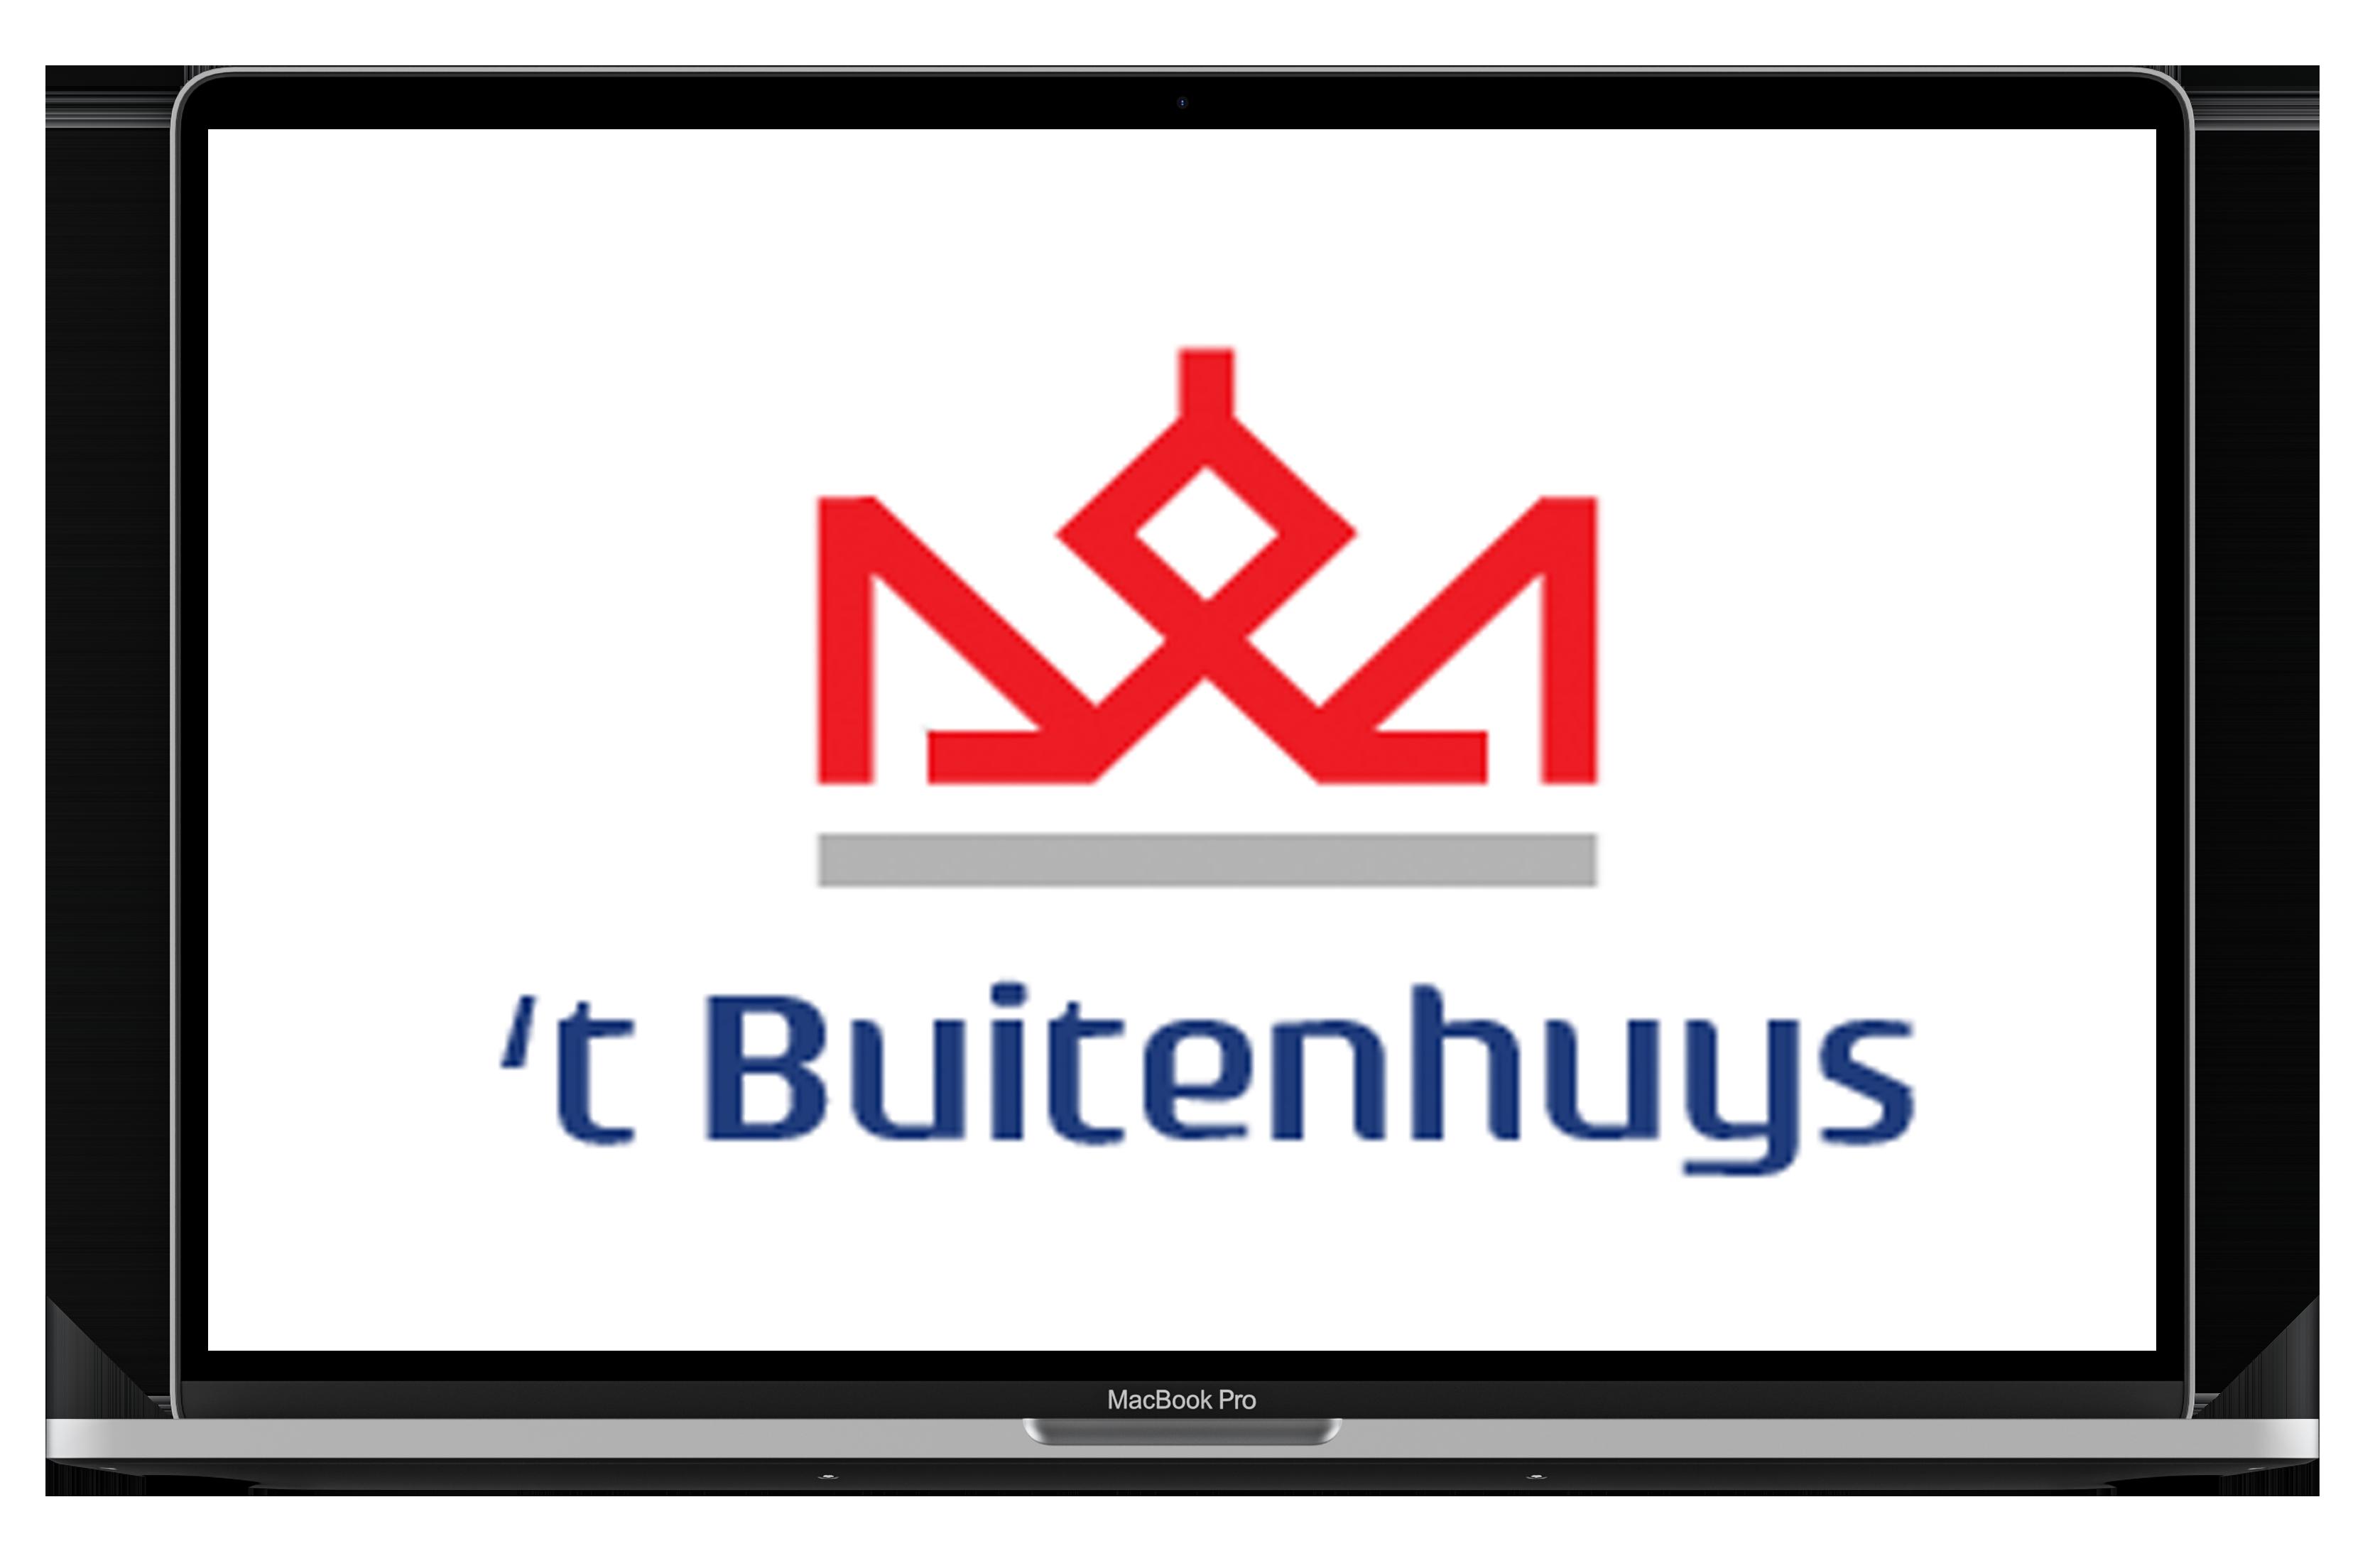 T Buitenhuys